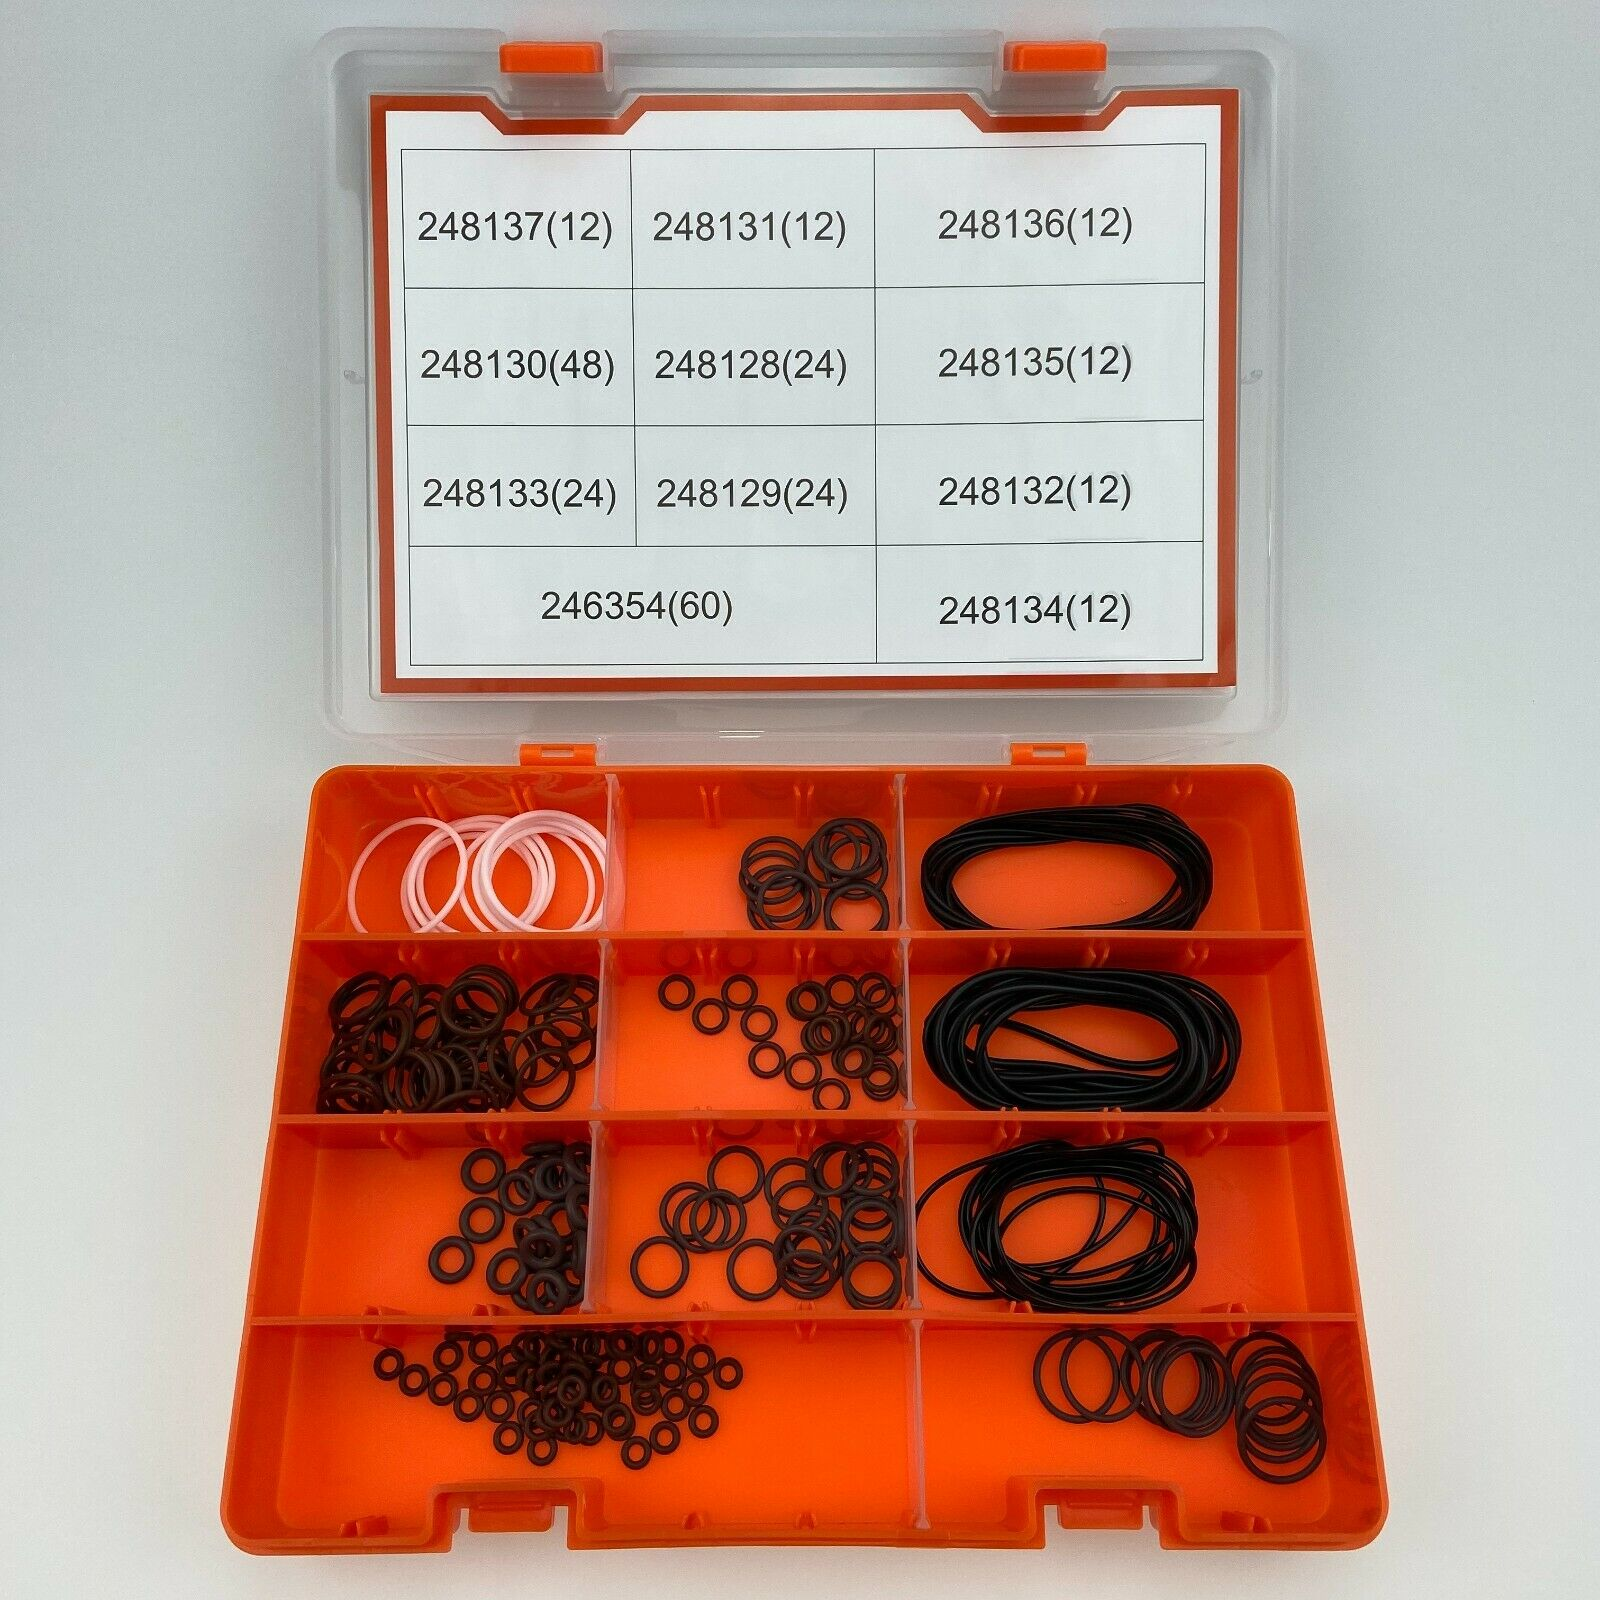 3 Sets O-ring Kits for Graco Fusion Gun Air Purge AP 246355 for sale online